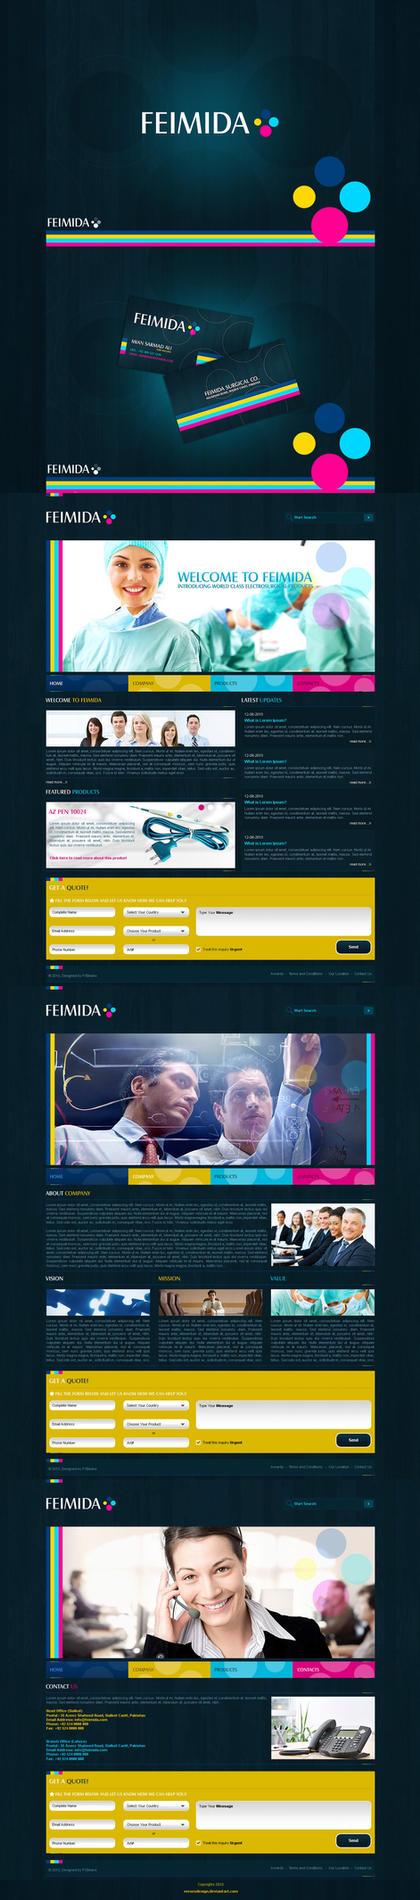 Feimida Corporate Identity by waseemarshad